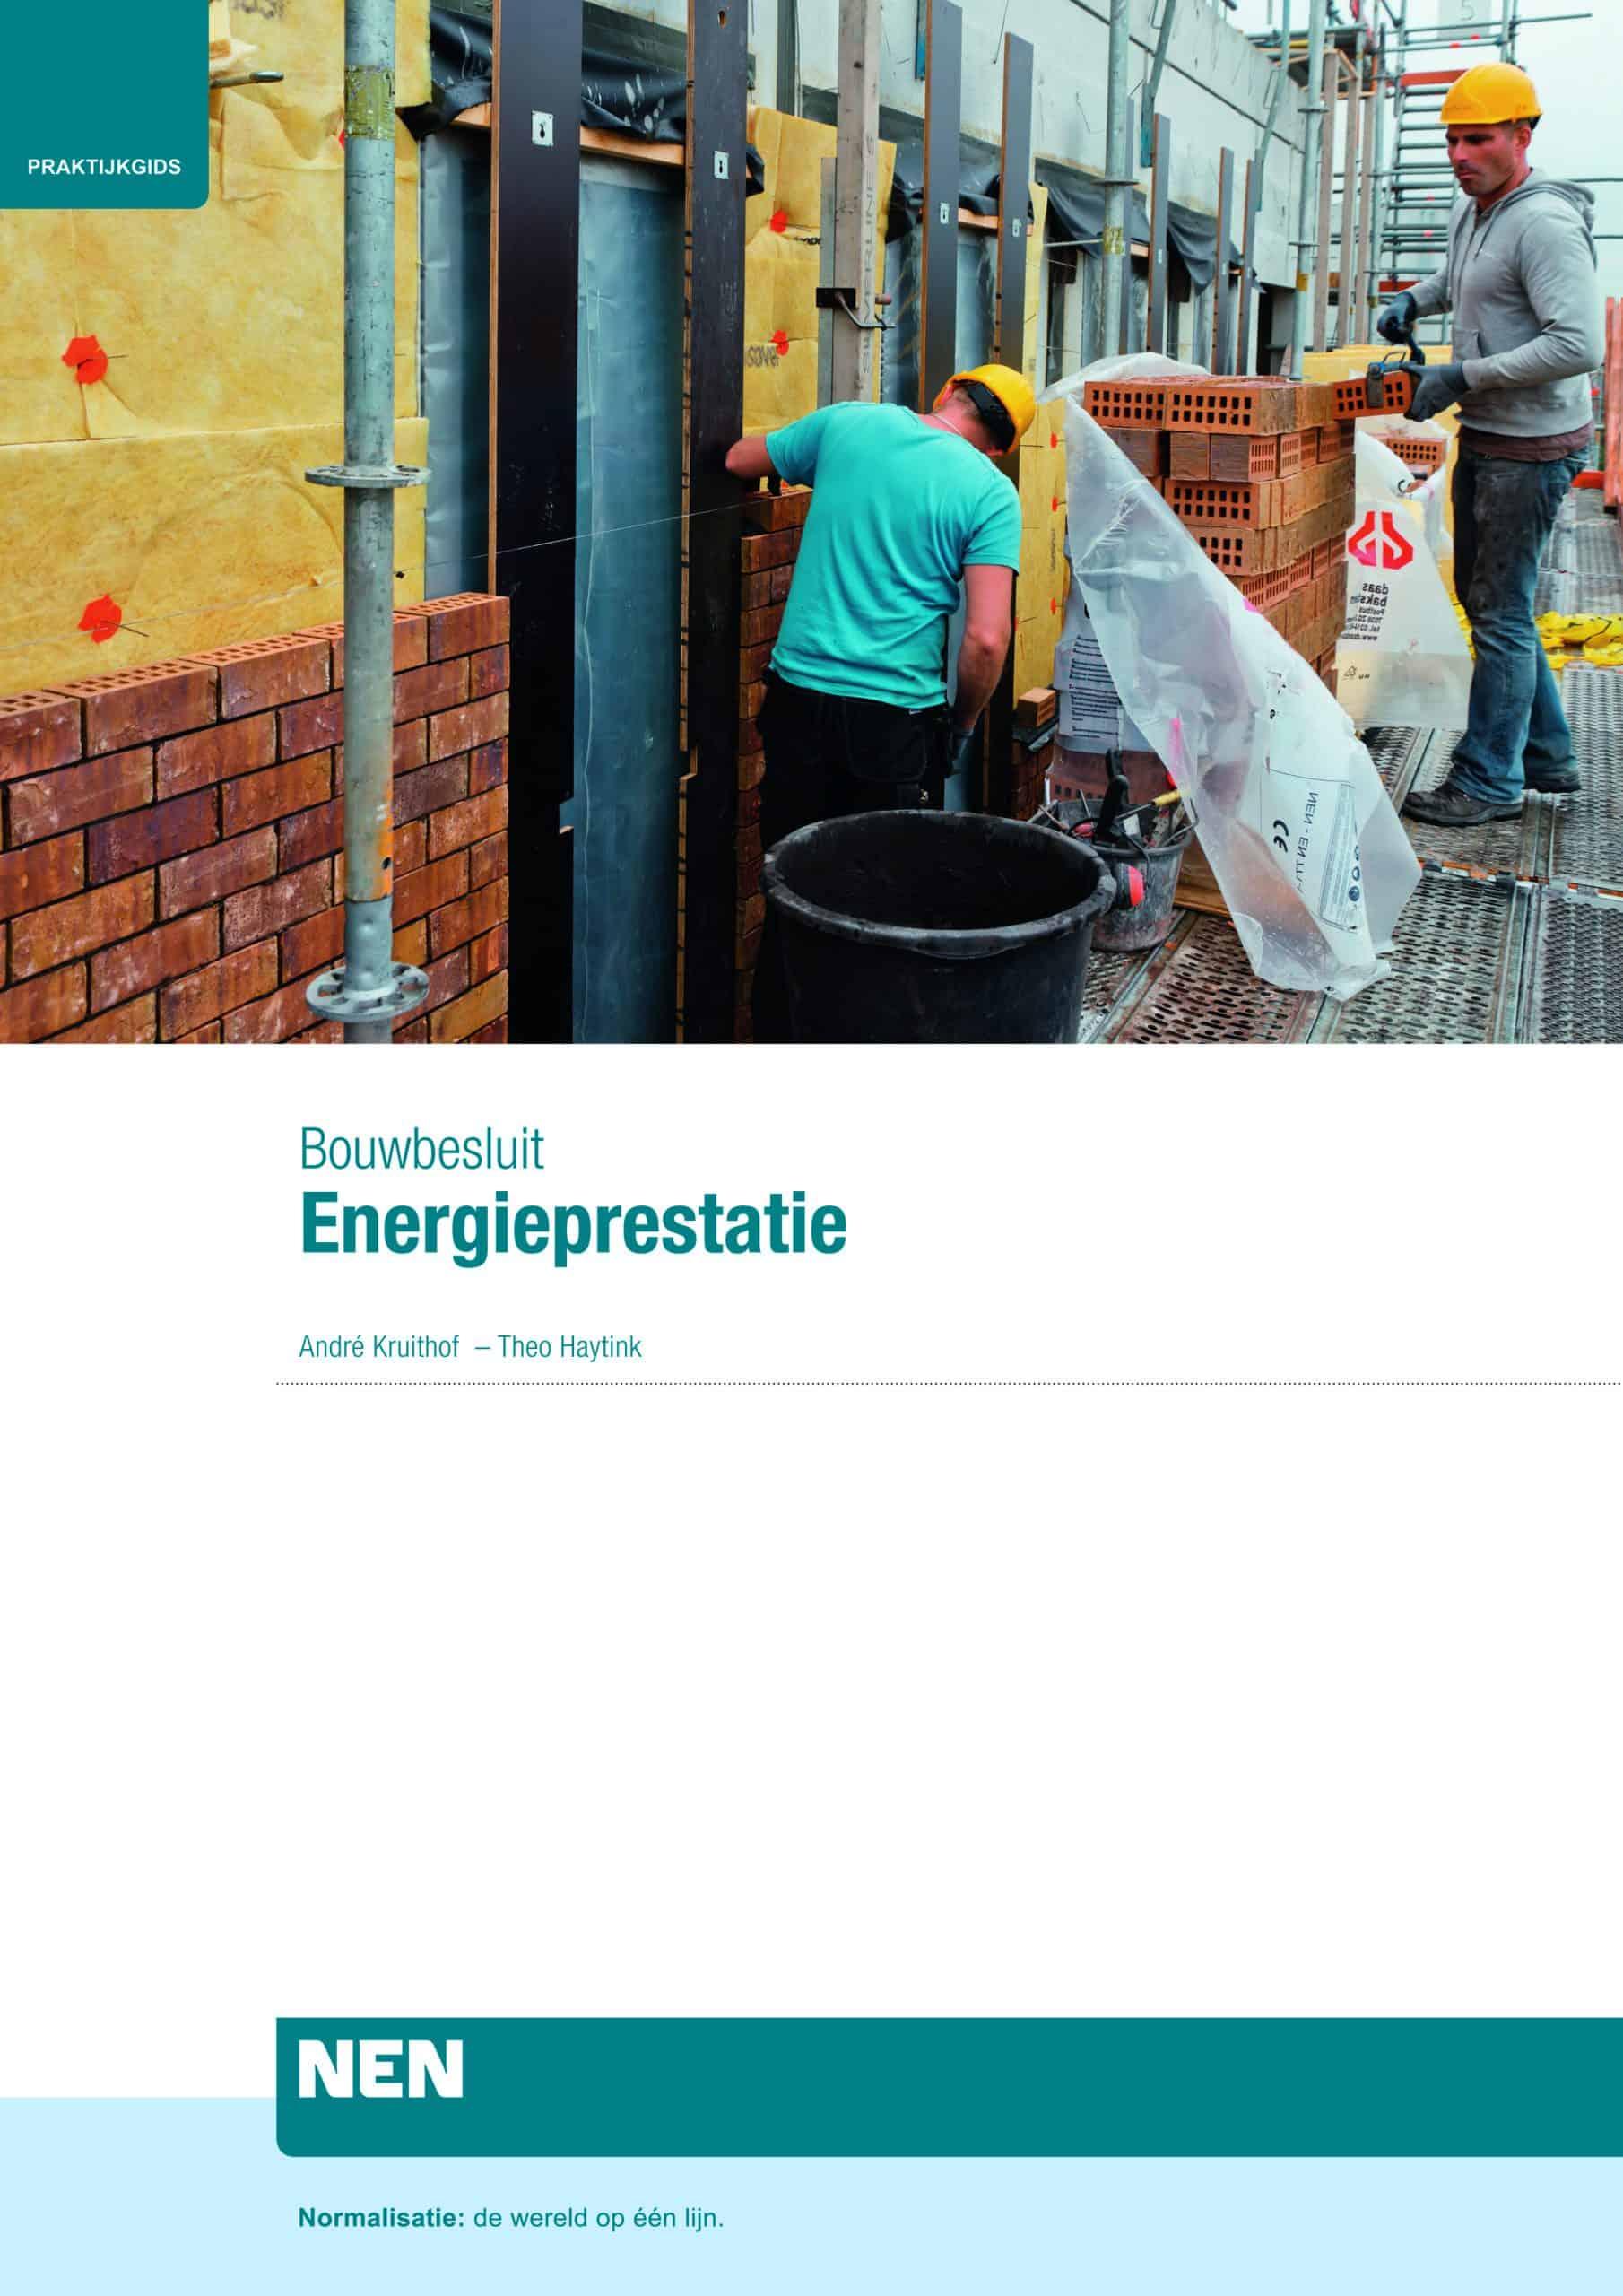 NEN_Omslag_PG_Energieprestaties_A4-3-scaled